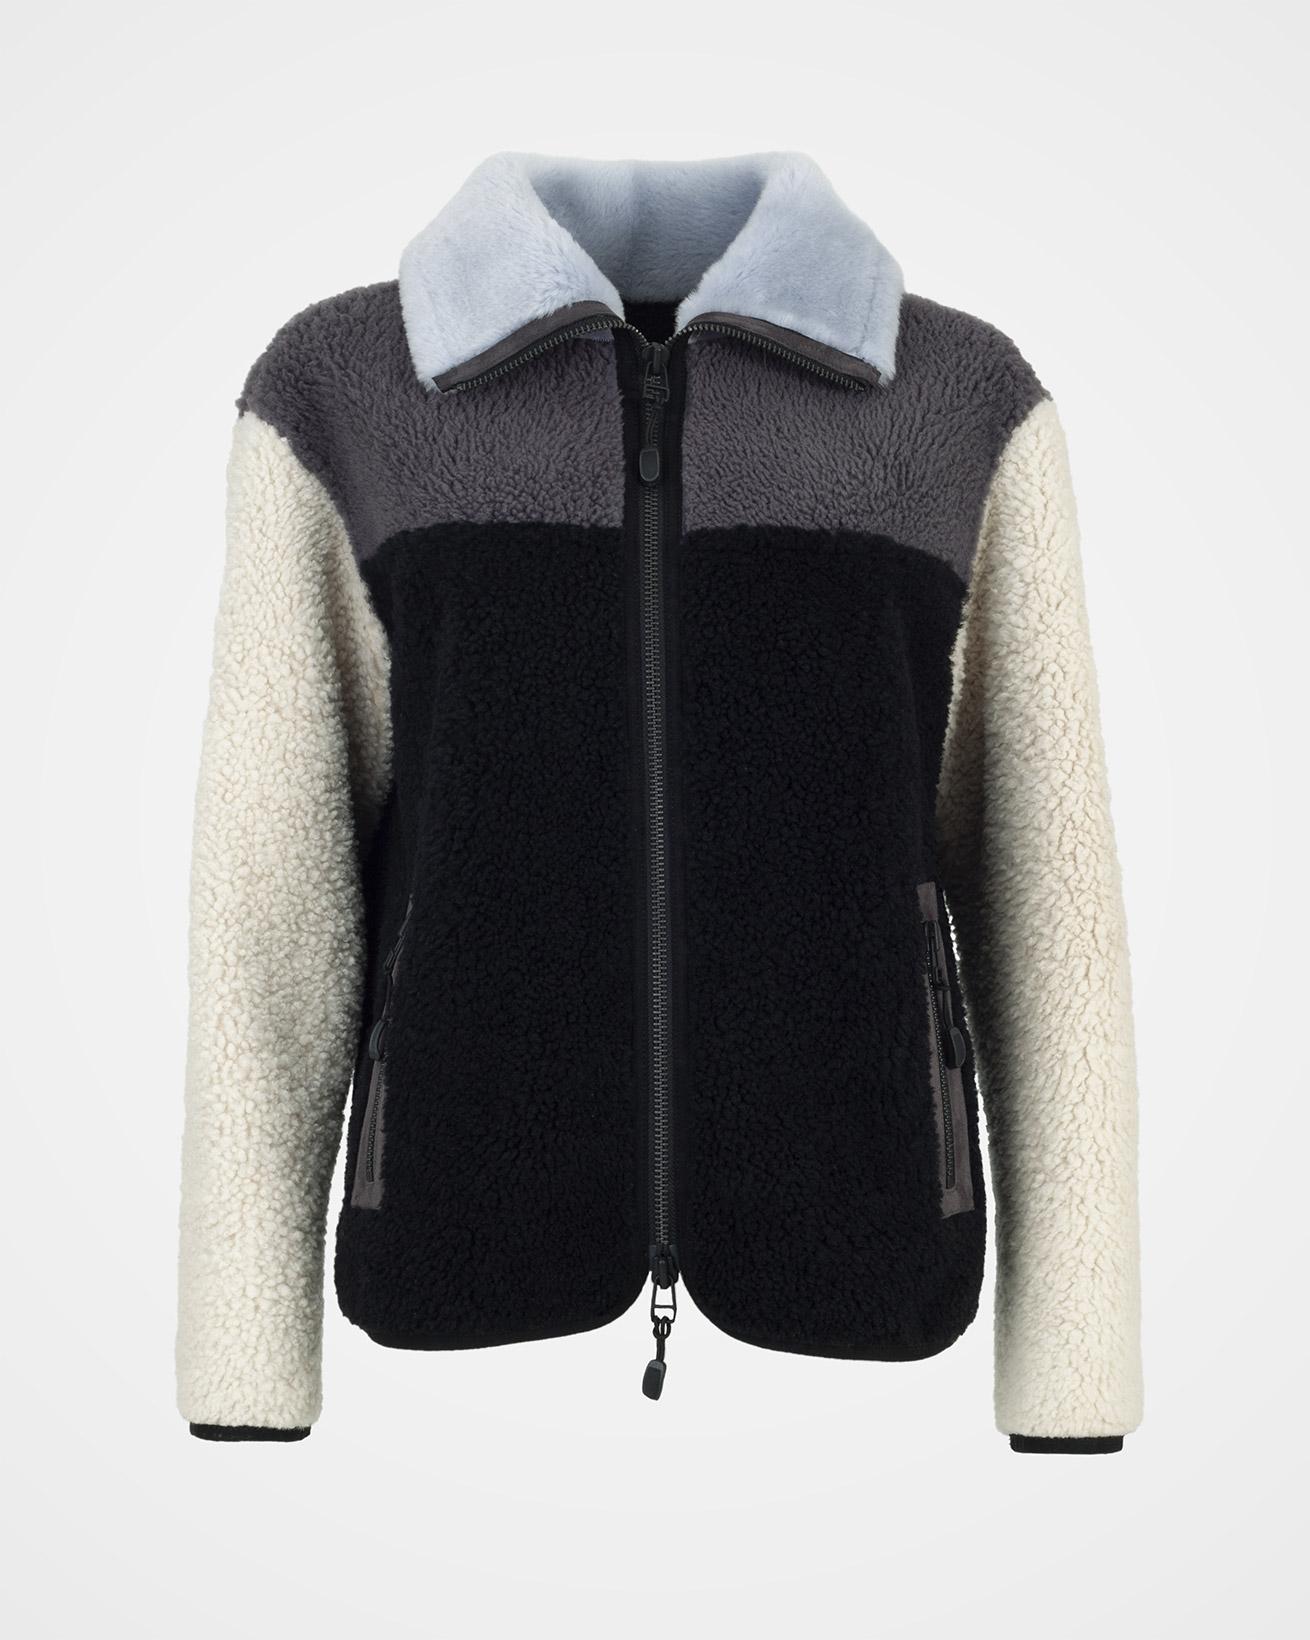 Sporty Colourblock Sheepskin Jacket - Size 10 - Navy - 2008